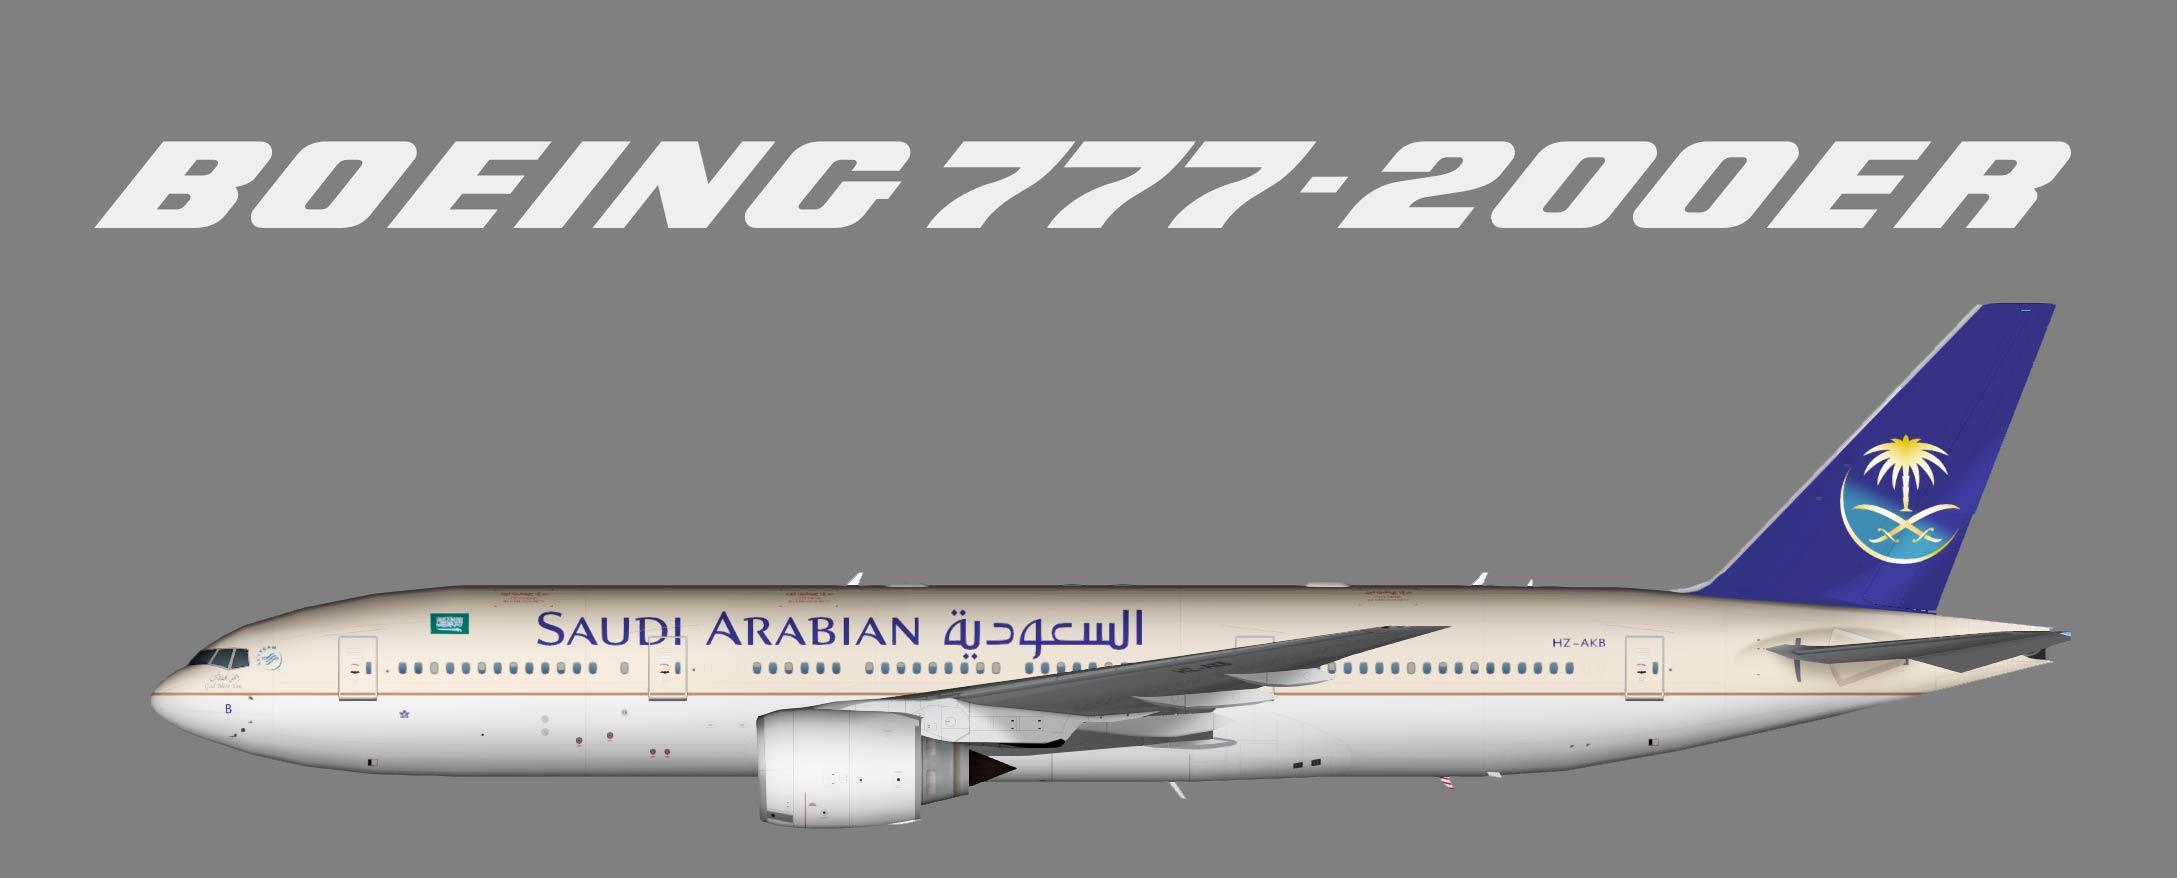 Saudia Boeing 777-200ER